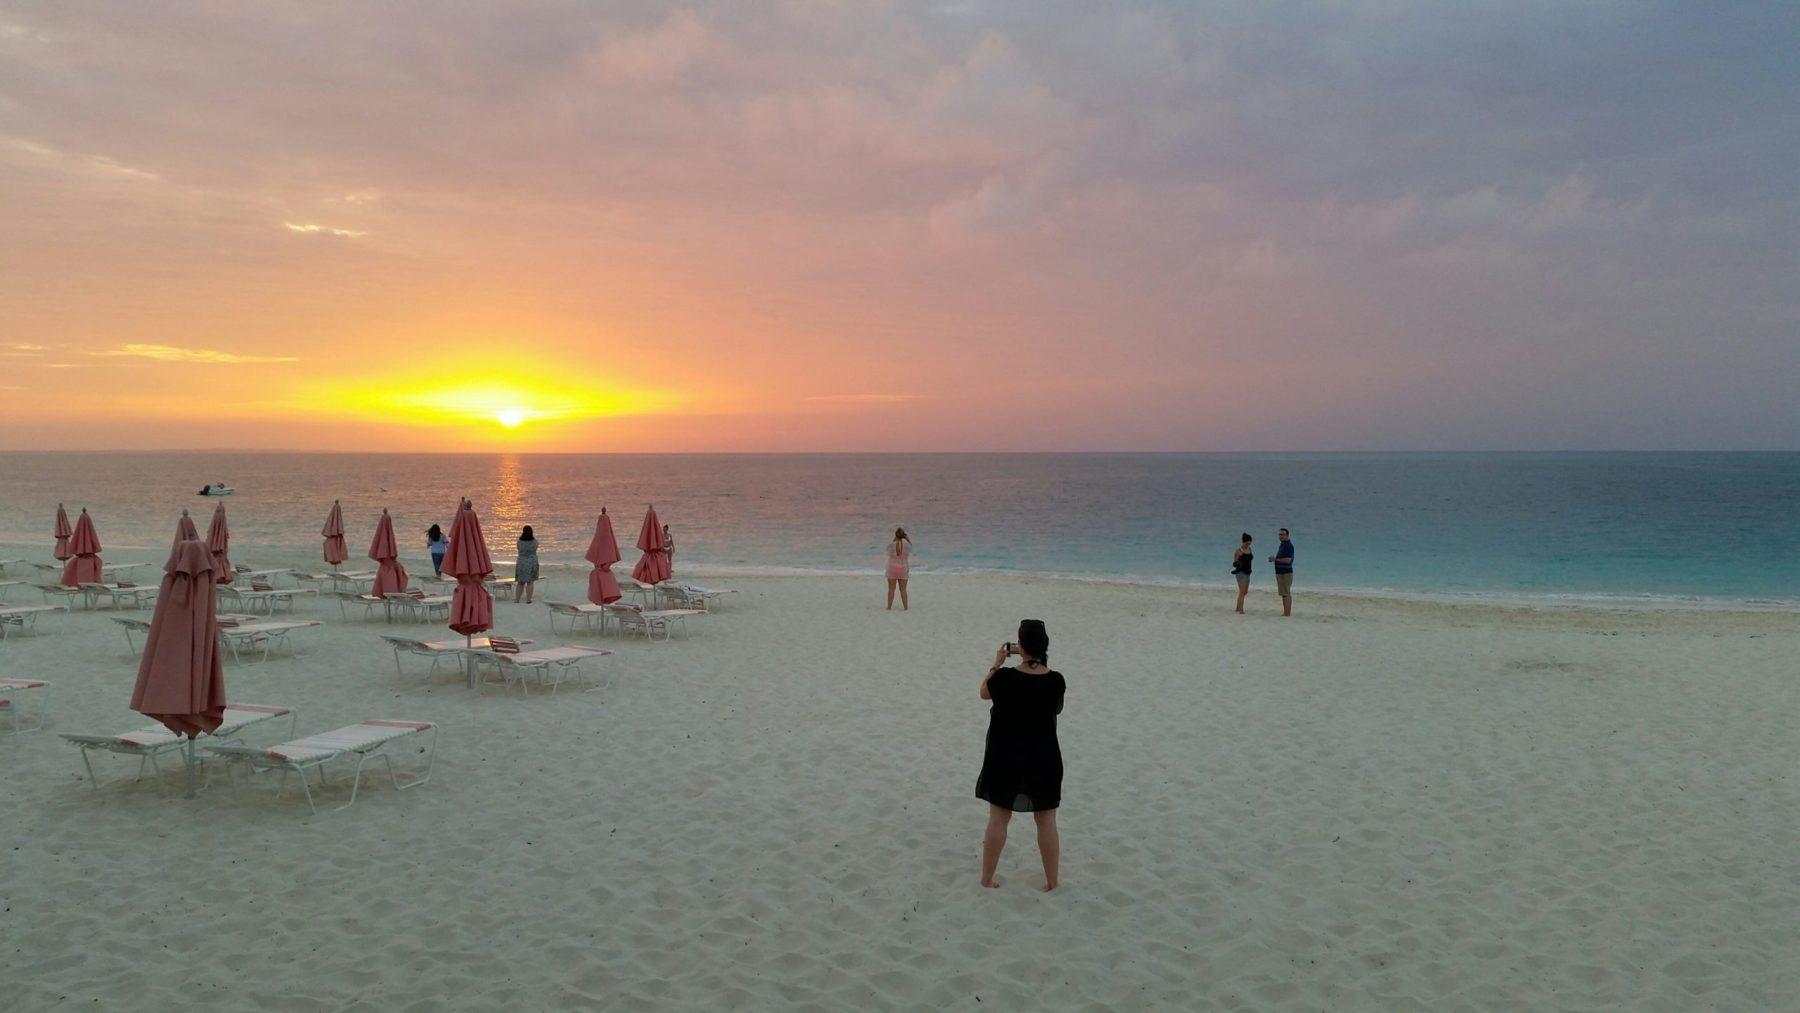 Ocean Club Westin Turks and Caicos - Travel Dreams Magazine